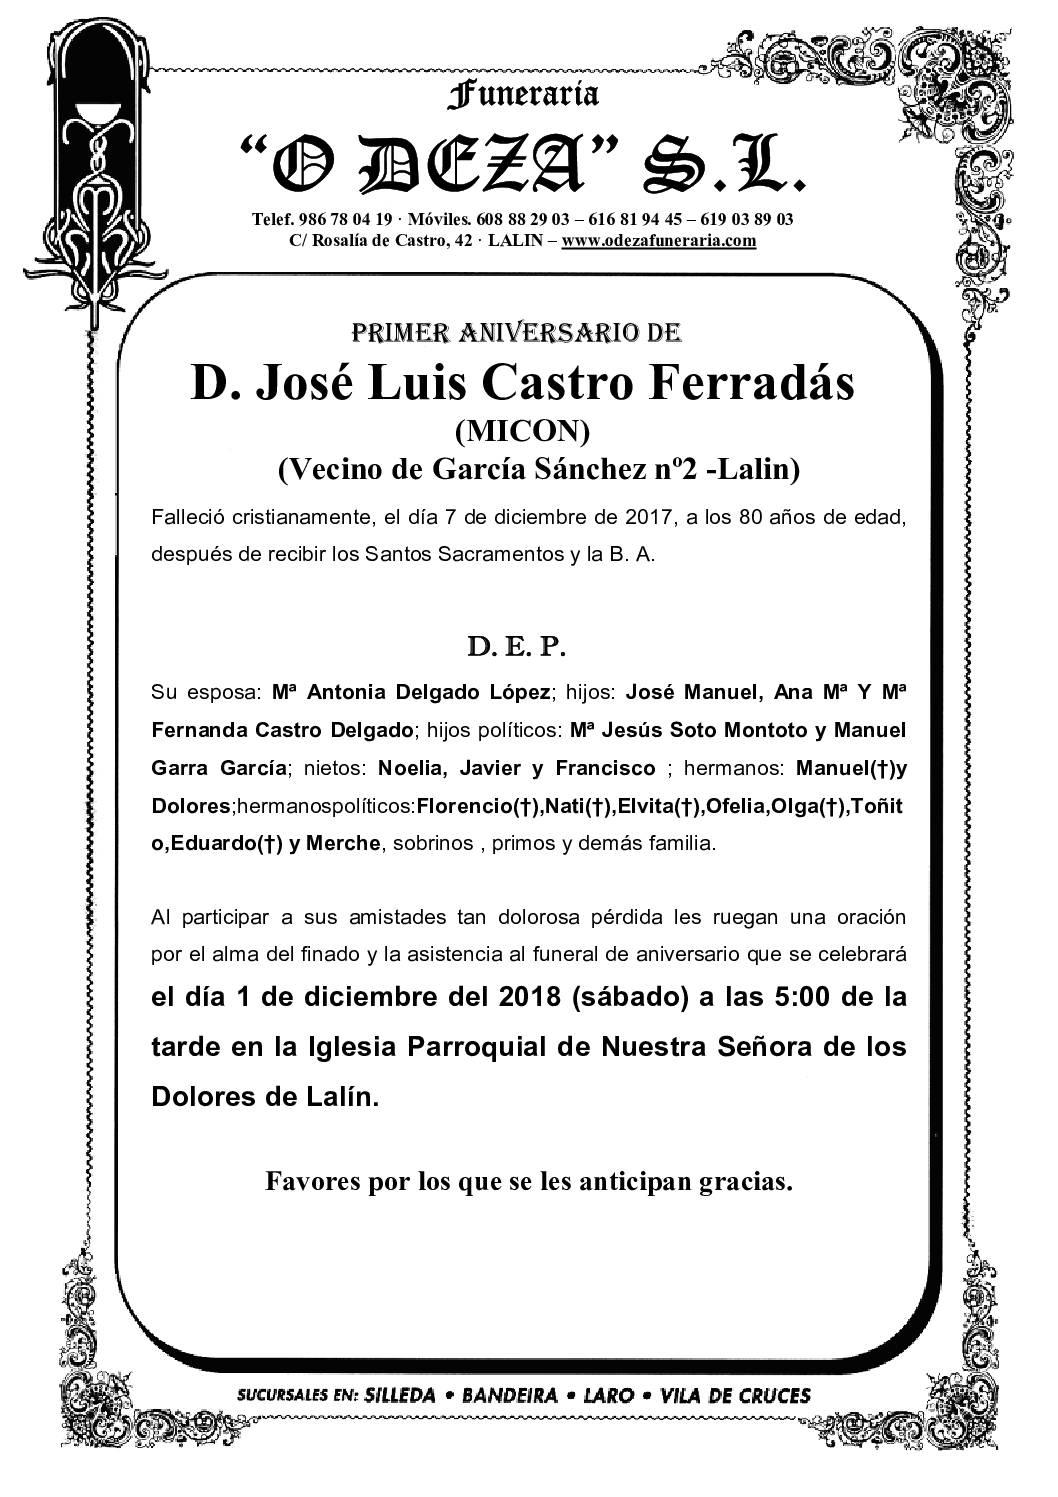 D. JOSÉ LUIS CASTRO FERRADÁS